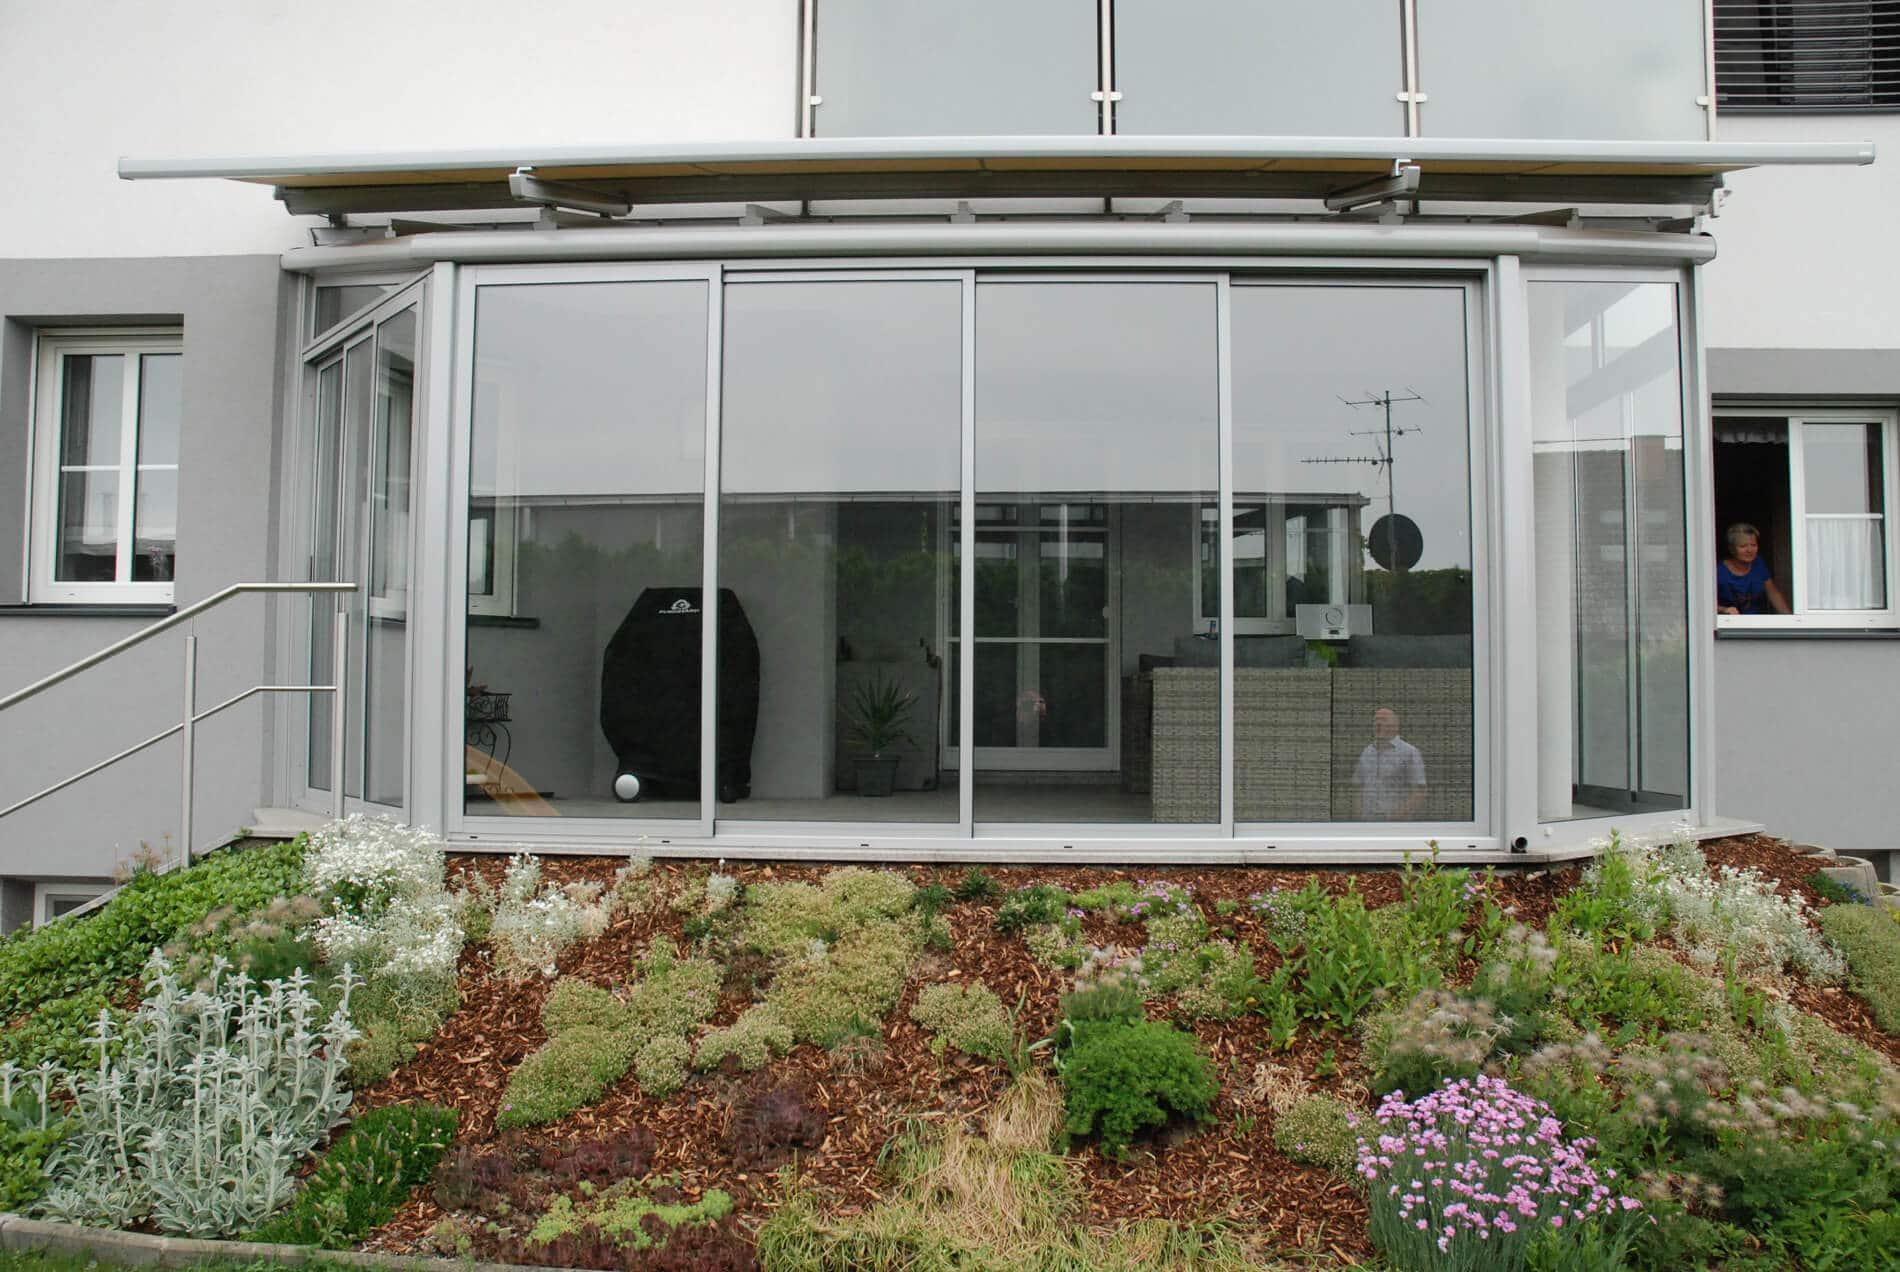 Wintergarten aus Aluminium mit Beschattung